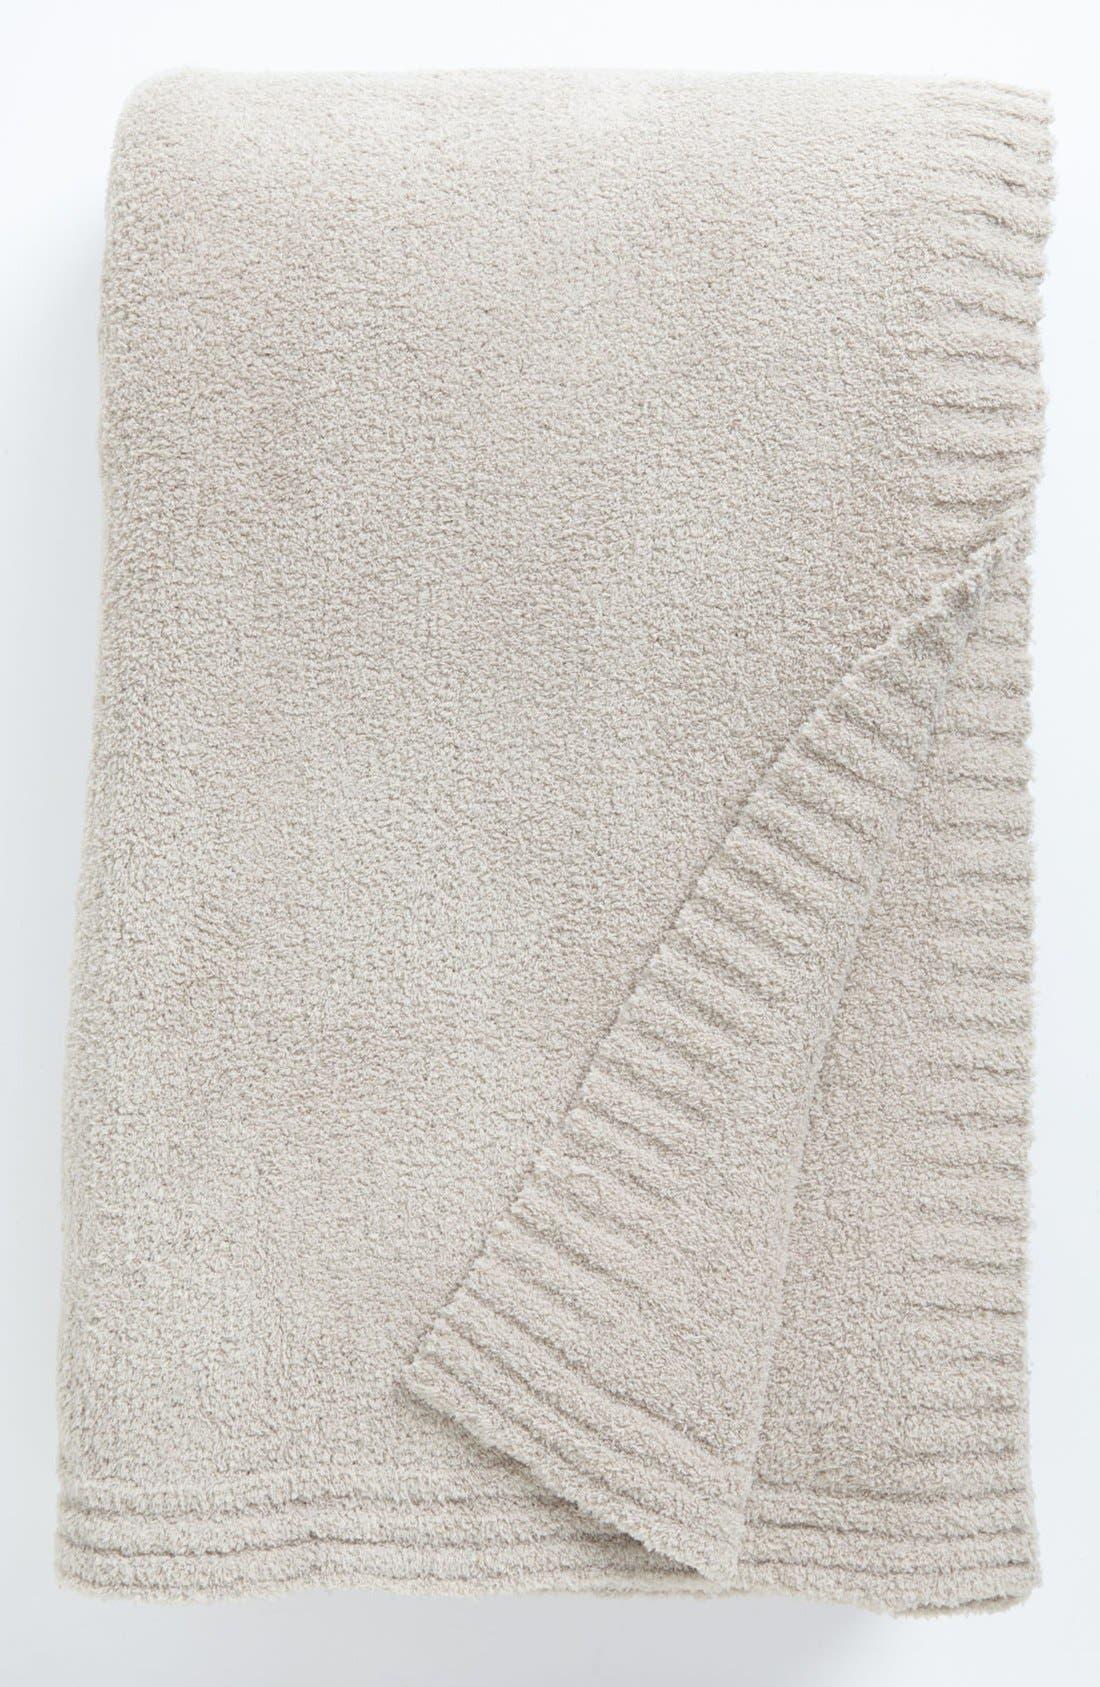 'Butter' Knit Blanket,                             Main thumbnail 1, color,                             280